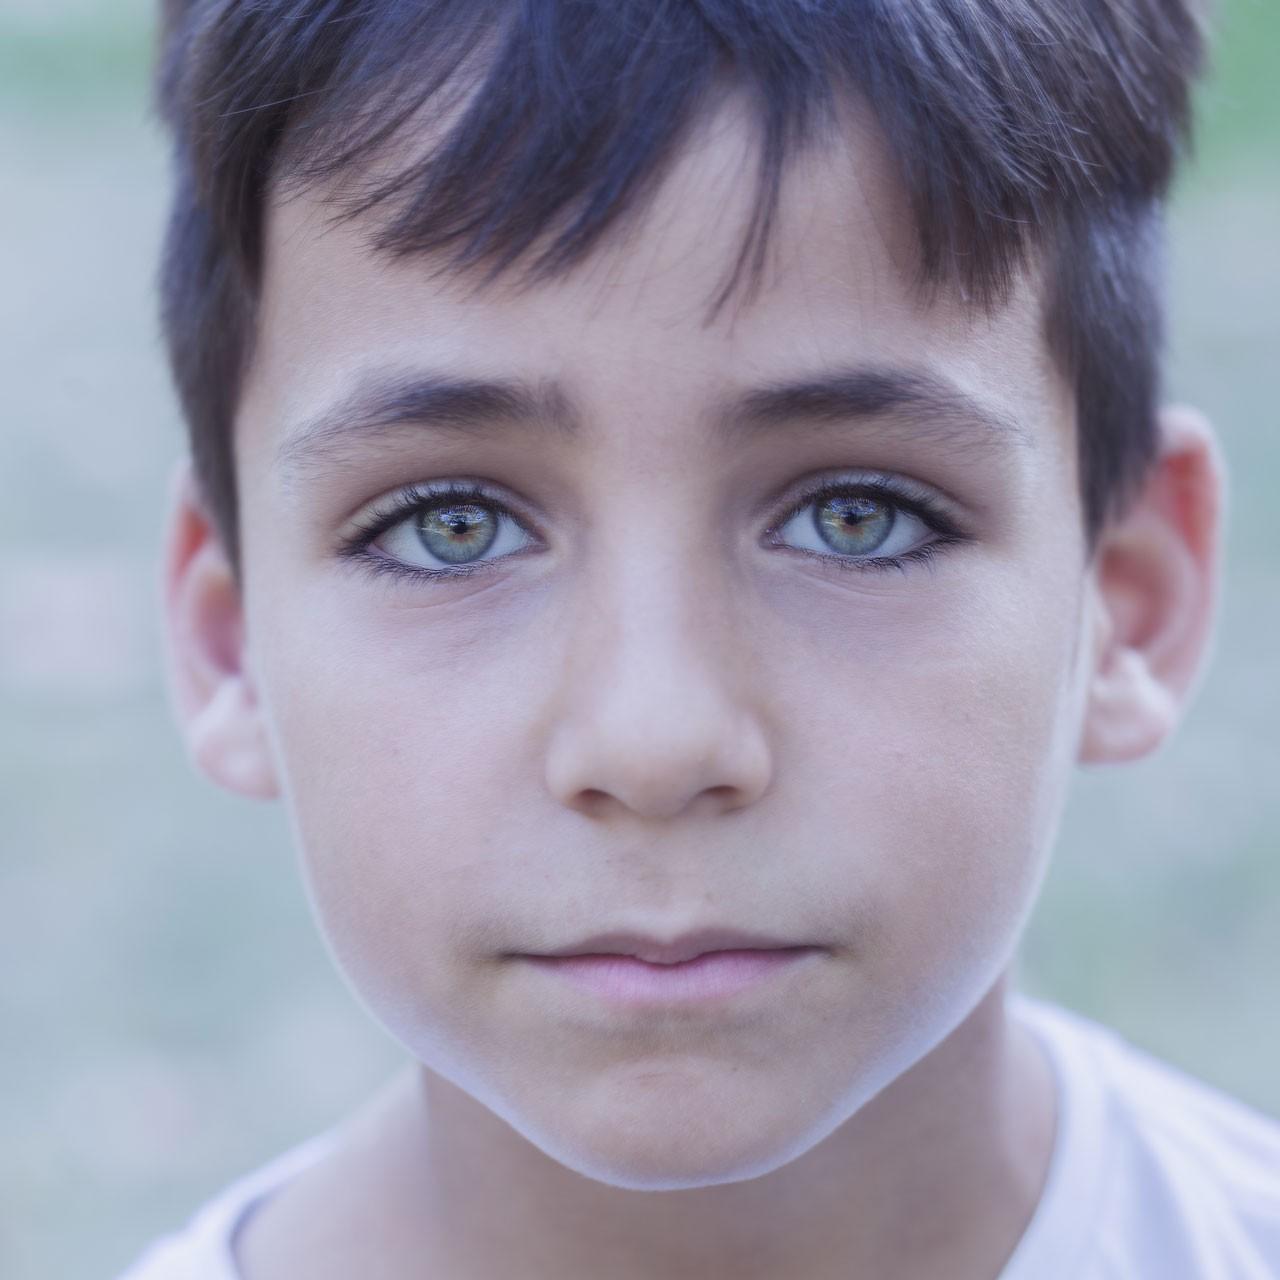 Child and Adolescent Psychiatrist Madrid